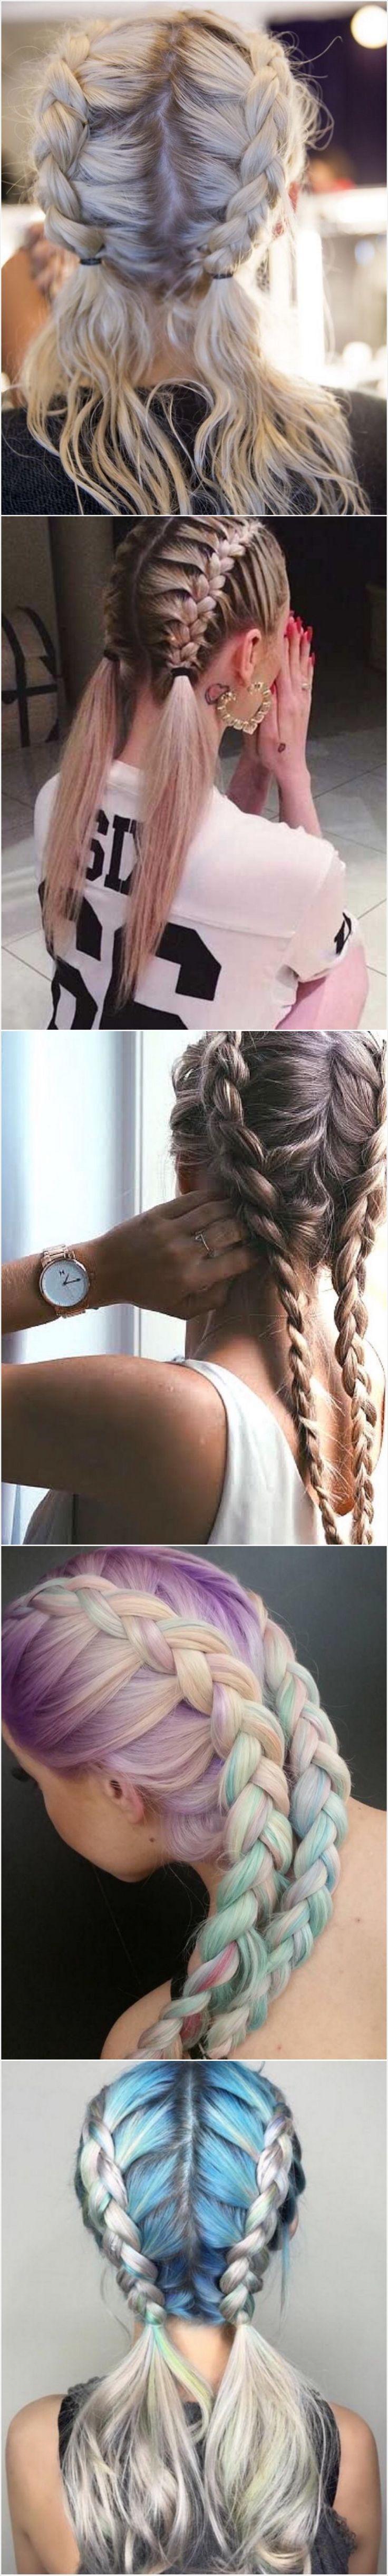 Braided Hairstyles Ideas #braids...